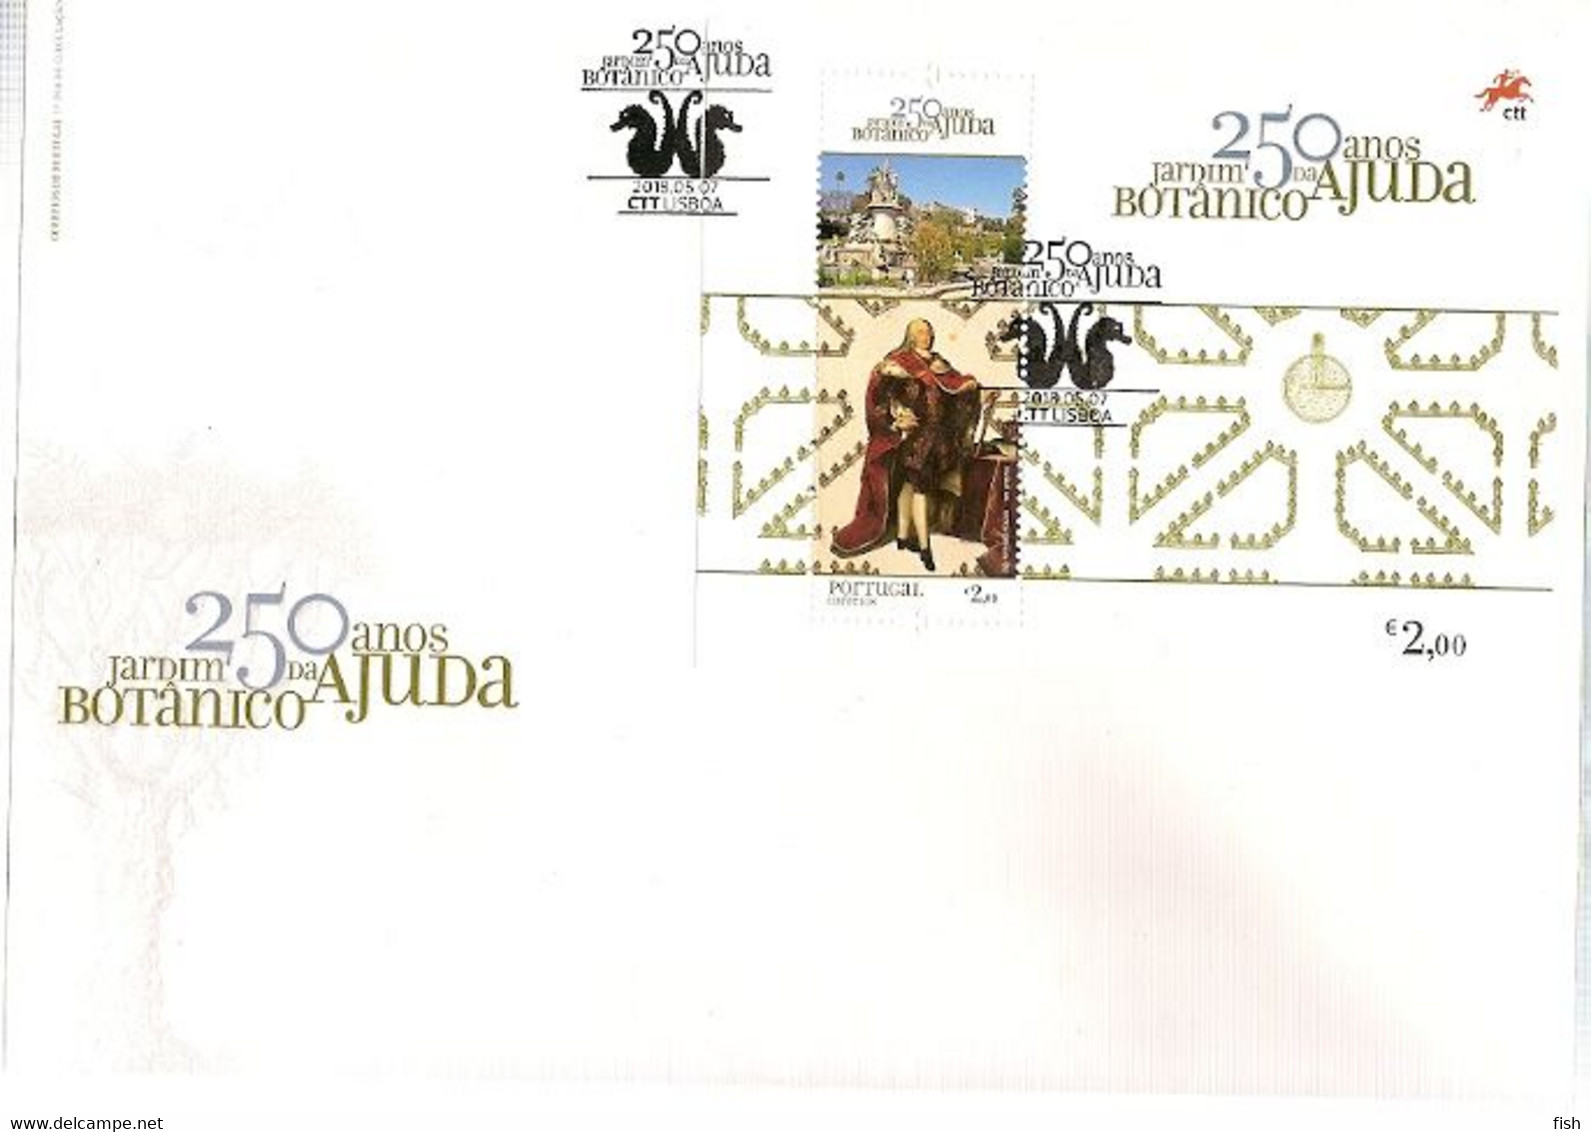 Portugal & FDCB Botanical Garden Of Ajuda 25th Anniversary, Lisbon 2018 (3243) - Plants